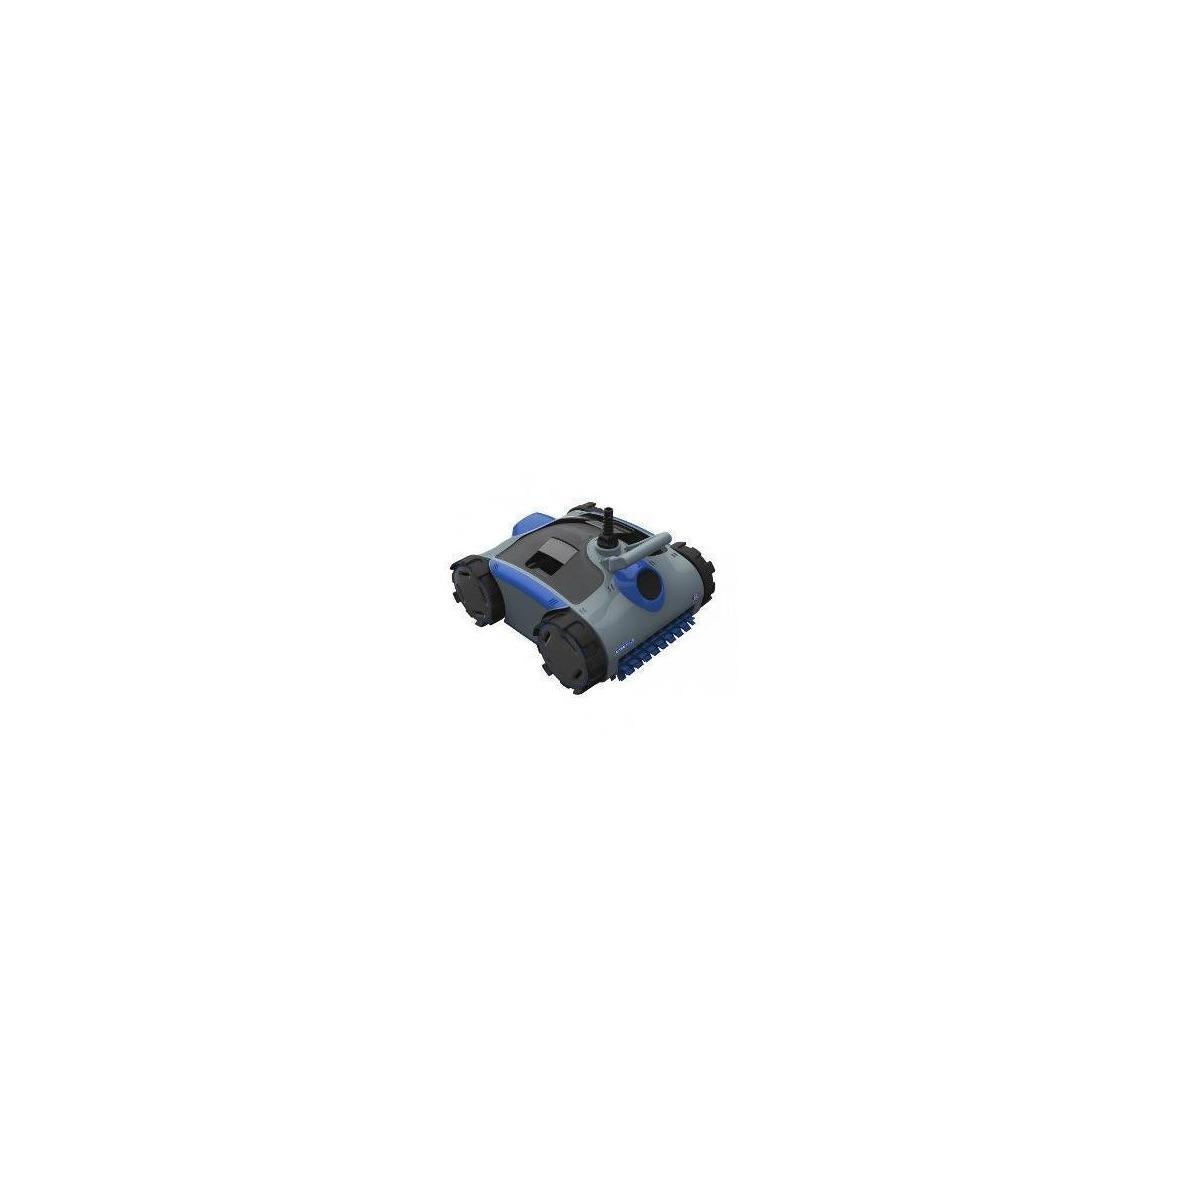 Limpiafondos R2 Astralpool